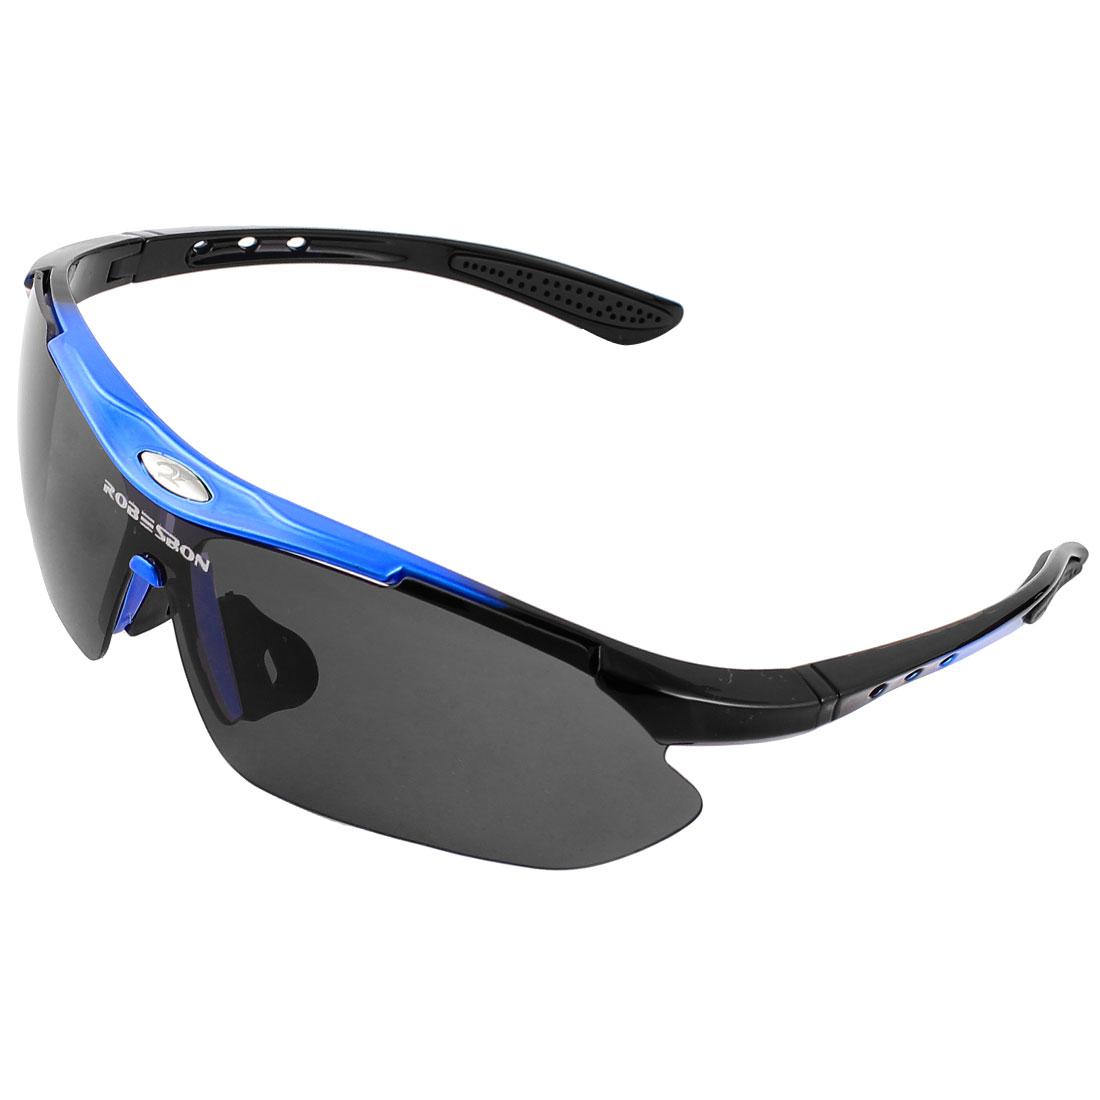 Outdoor Blue Black Plastic Half Frame Uni Lens Sunglasses for Woman Man